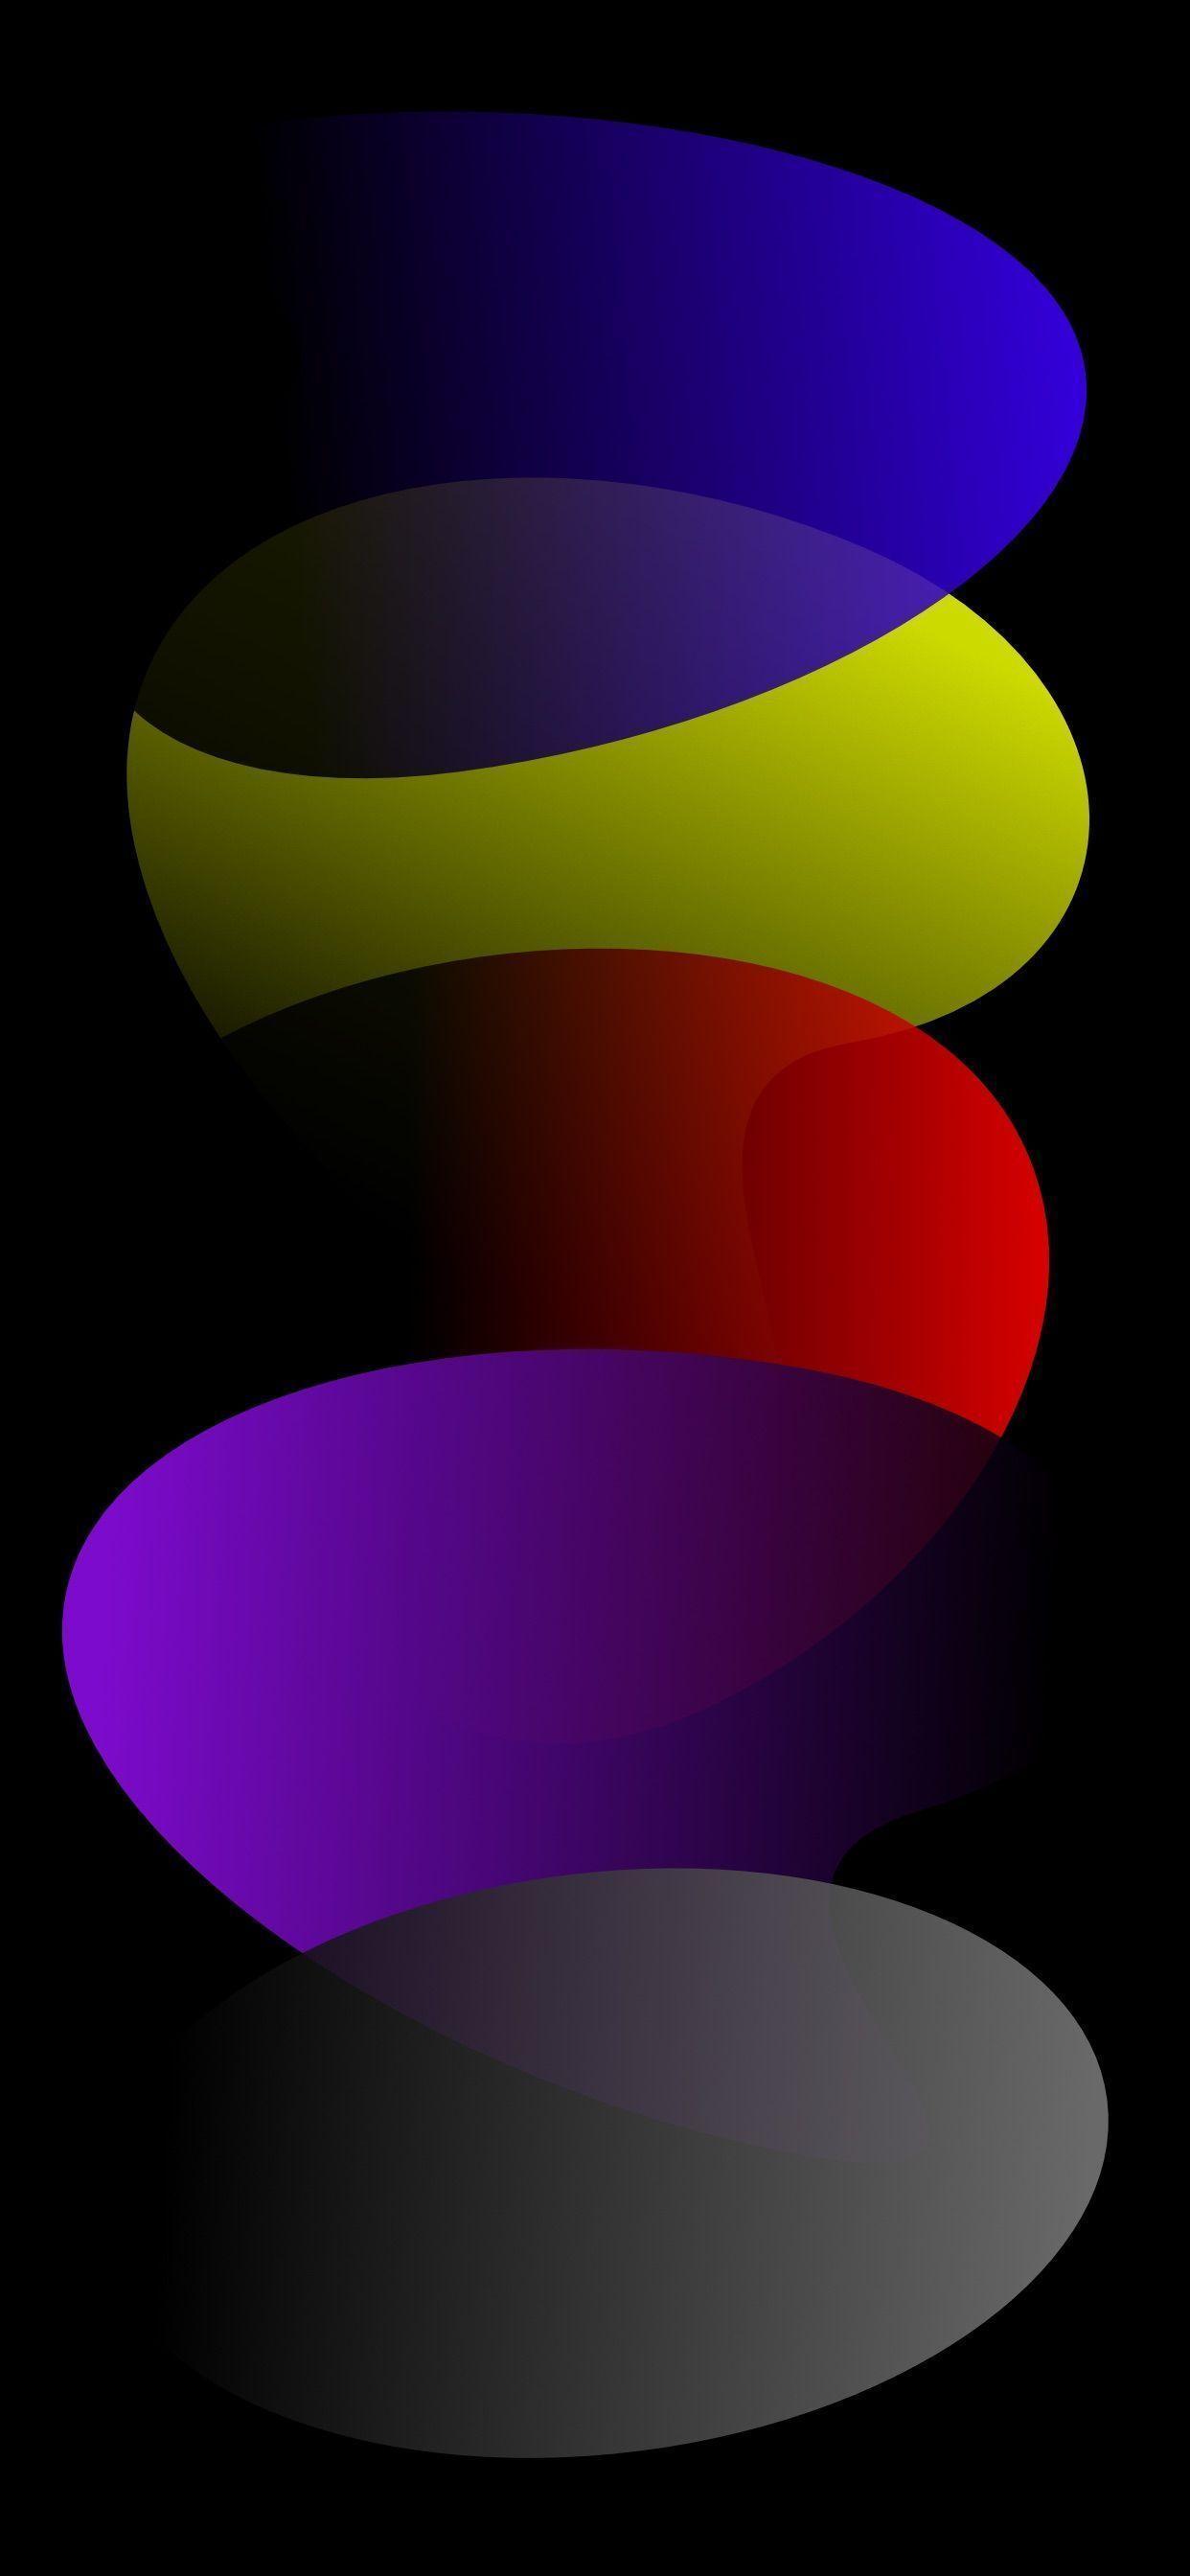 Kafamsal - Let's share something #ios13wallpaper #iOS11 #iOS12 #iOS13 #Lockscreen #Homescreen #backgrounds #Apple #iPhone #iPad #iOS #wallpaper #iPhoneX #iPhoneXS #iPhoneXR #iPhoneXSMax #Mojave #Catalina #uidesign #backgrounds #Screenshot #Apple #iPhone #iPad #iOS #AndroidOS #widescreen #edge #desktop #themes #followme #background #follow #random #xs #xsmax #design #wallpapers #oled #amoled #wwdc #android #checkm8 #checkra1n #checkrain #ios13wallpaper Kafamsal - Let's share something #ios13wallp #ios13wallpaper